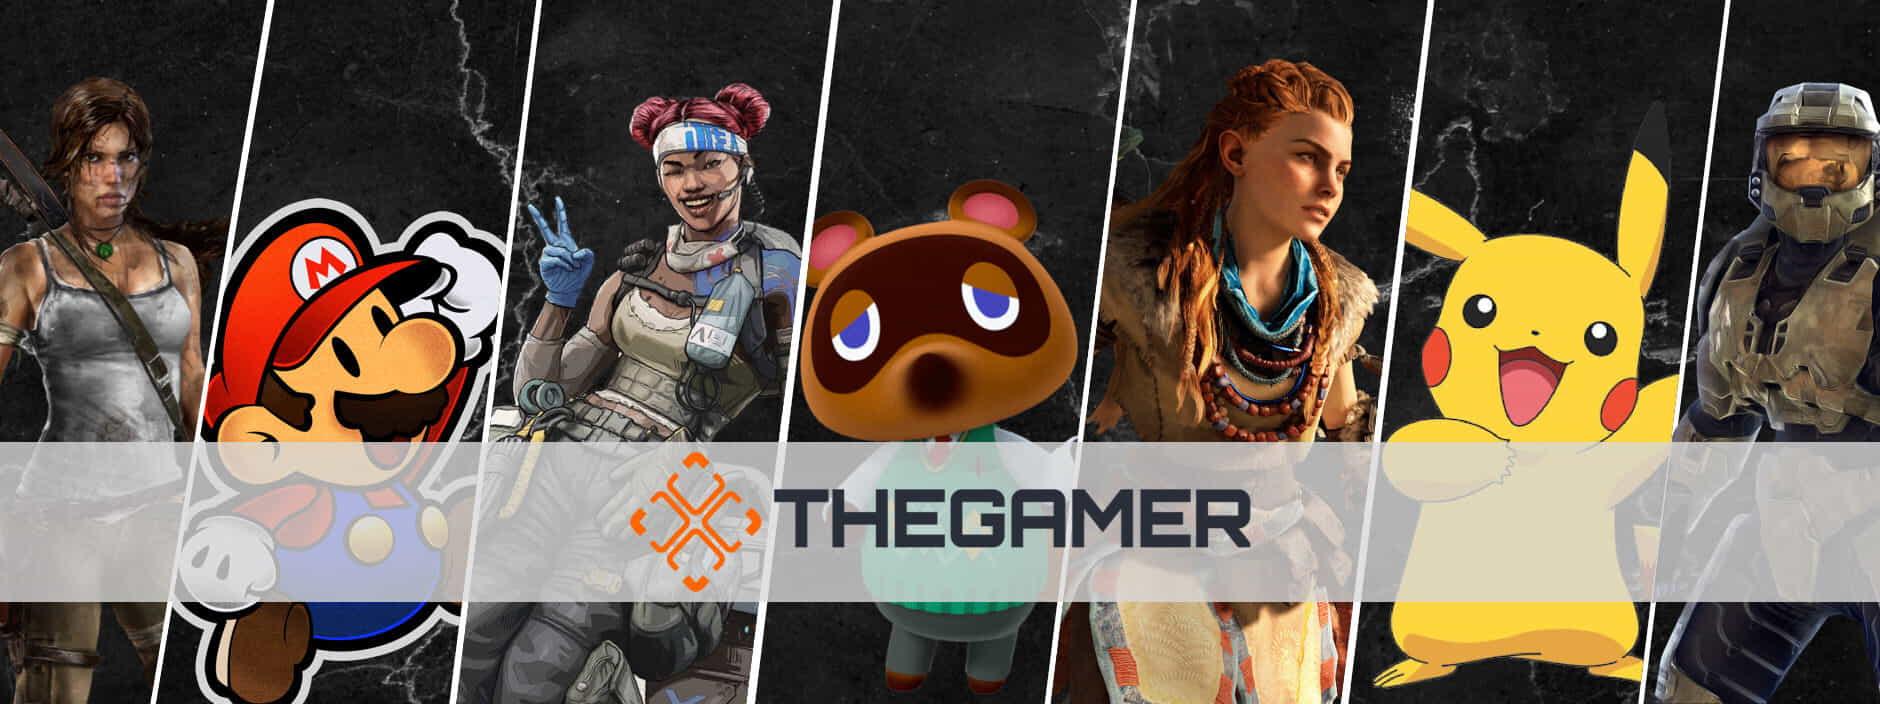 Lowongan Kerja Full Remote Video Game Strategy Guide Writer (TheGamer)